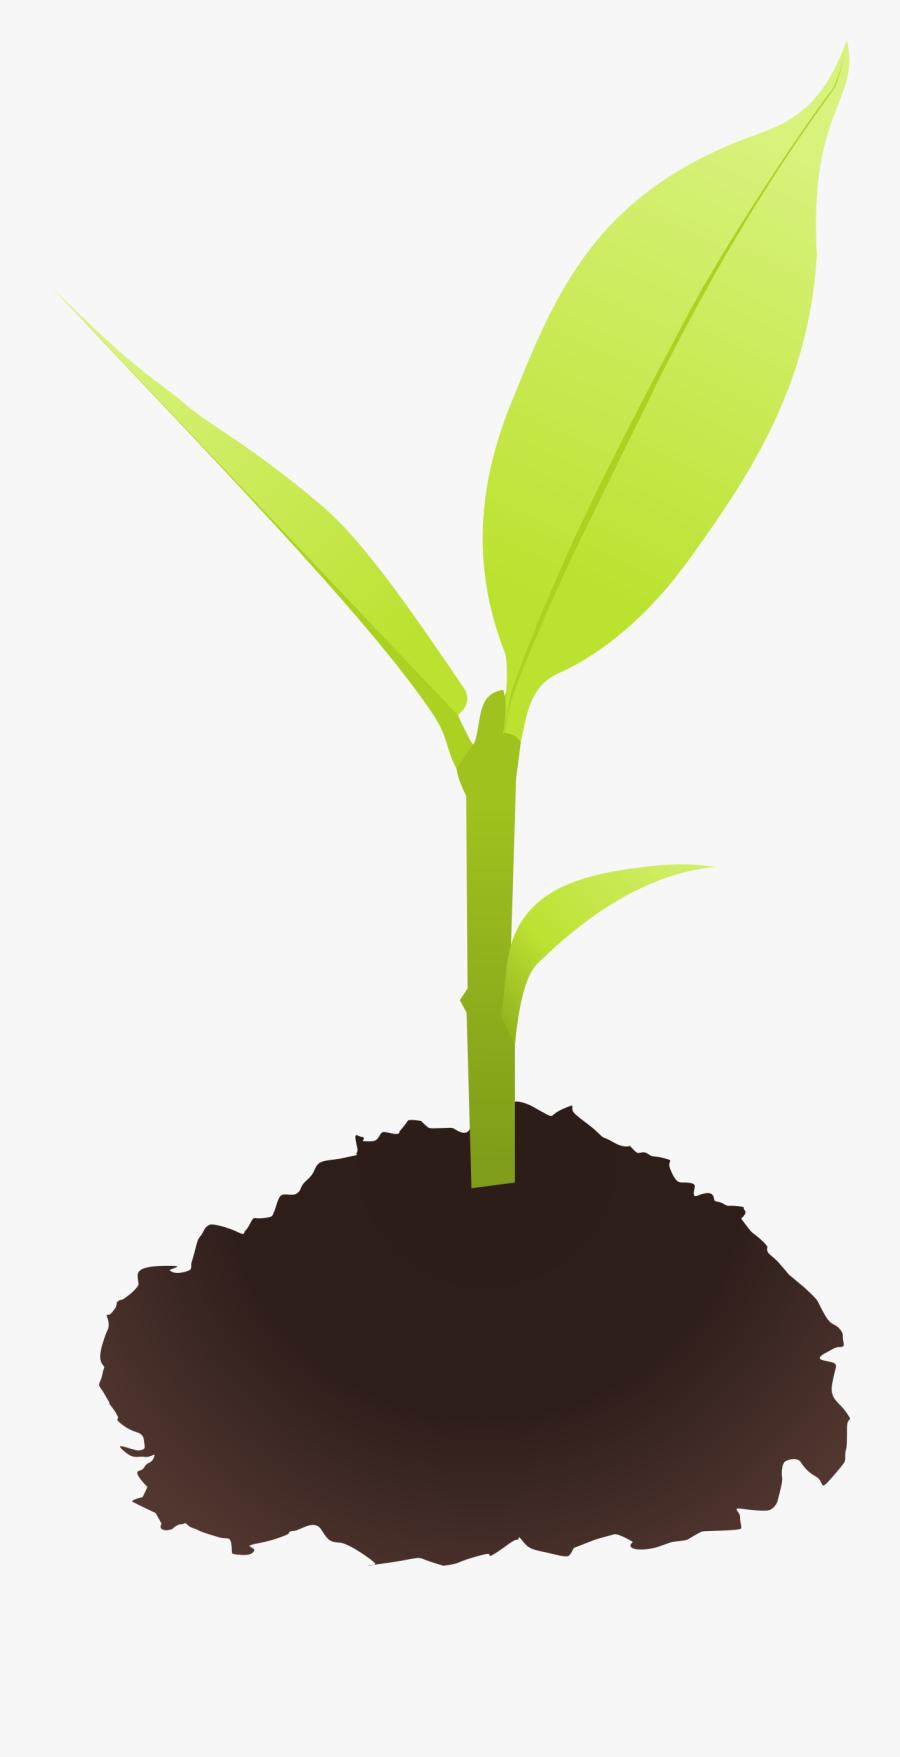 Clip Art Royalty Free Download Plant - Small Plant Clip Art, Transparent Clipart